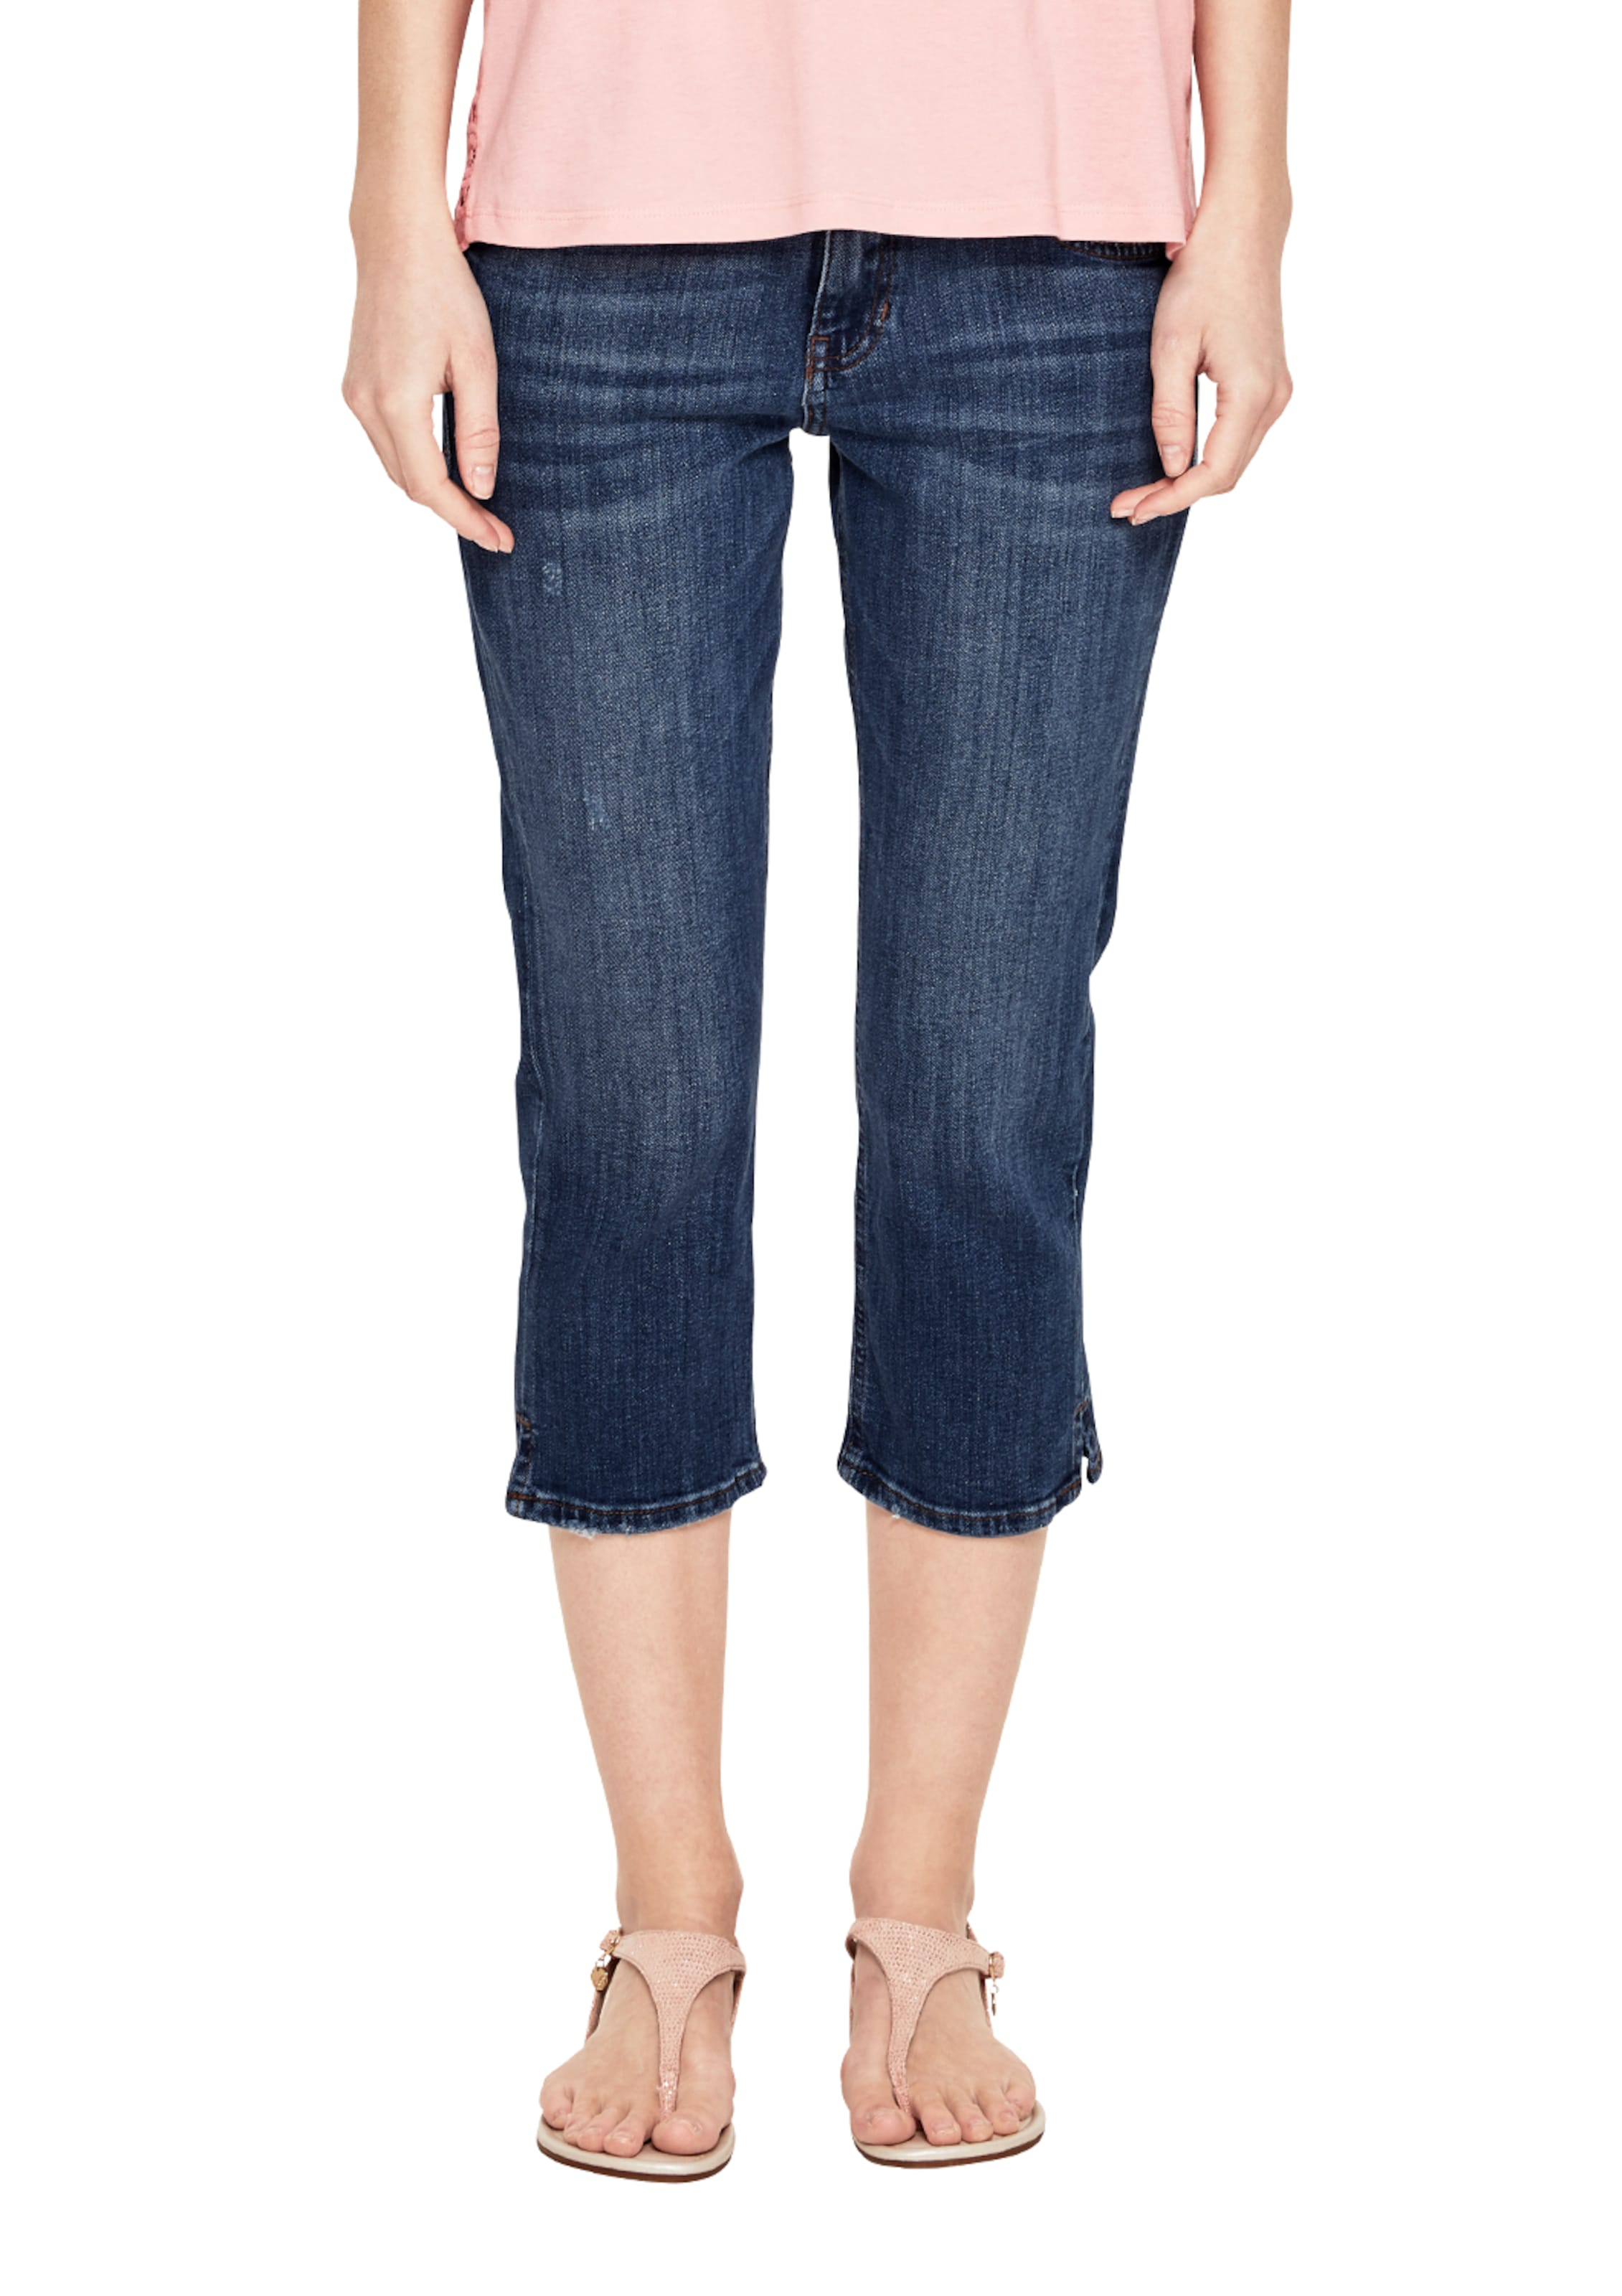 pocket S oliver jeans Label Dunkelblau Red 5 In rdhtQsCx